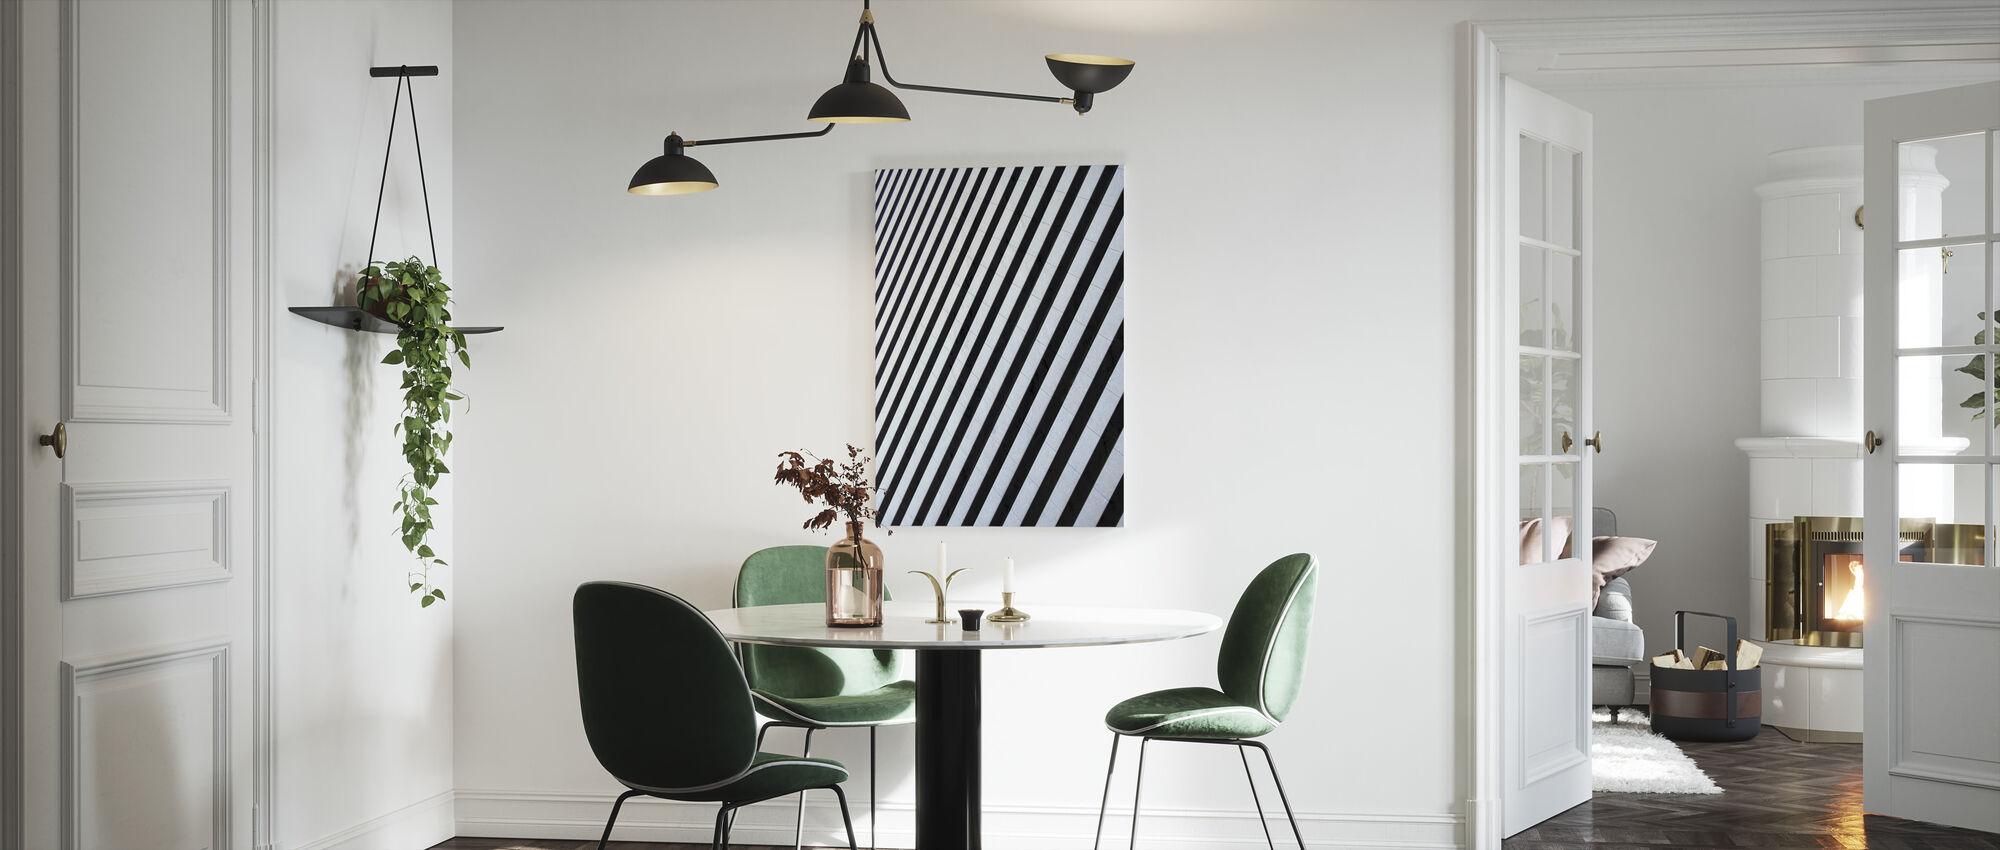 Microworld Space - Canvas print - Kitchen